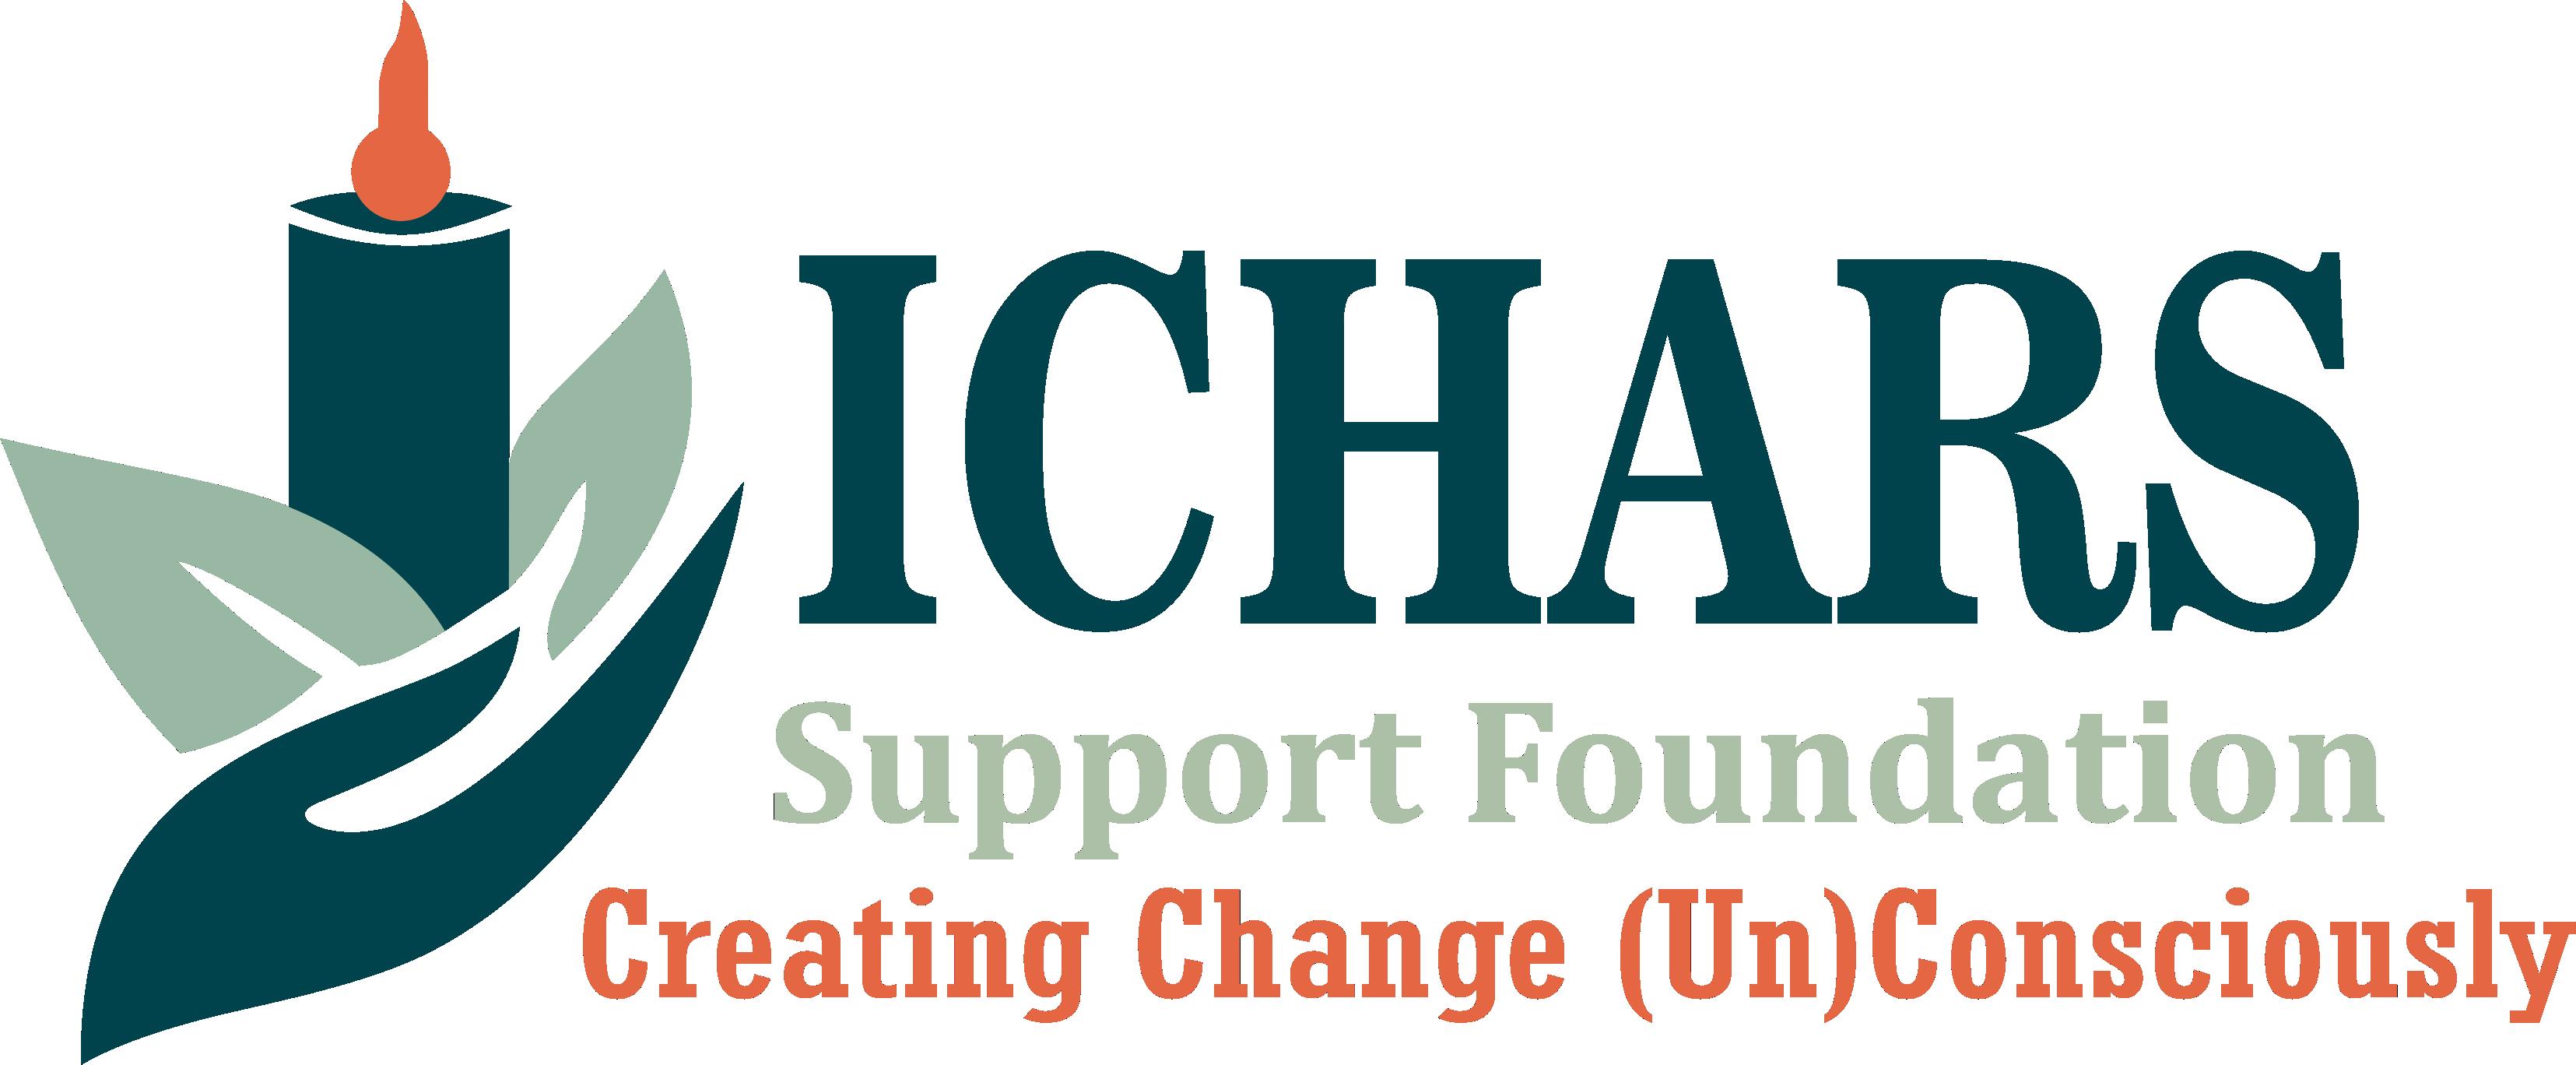 ICHARS Support Foundation